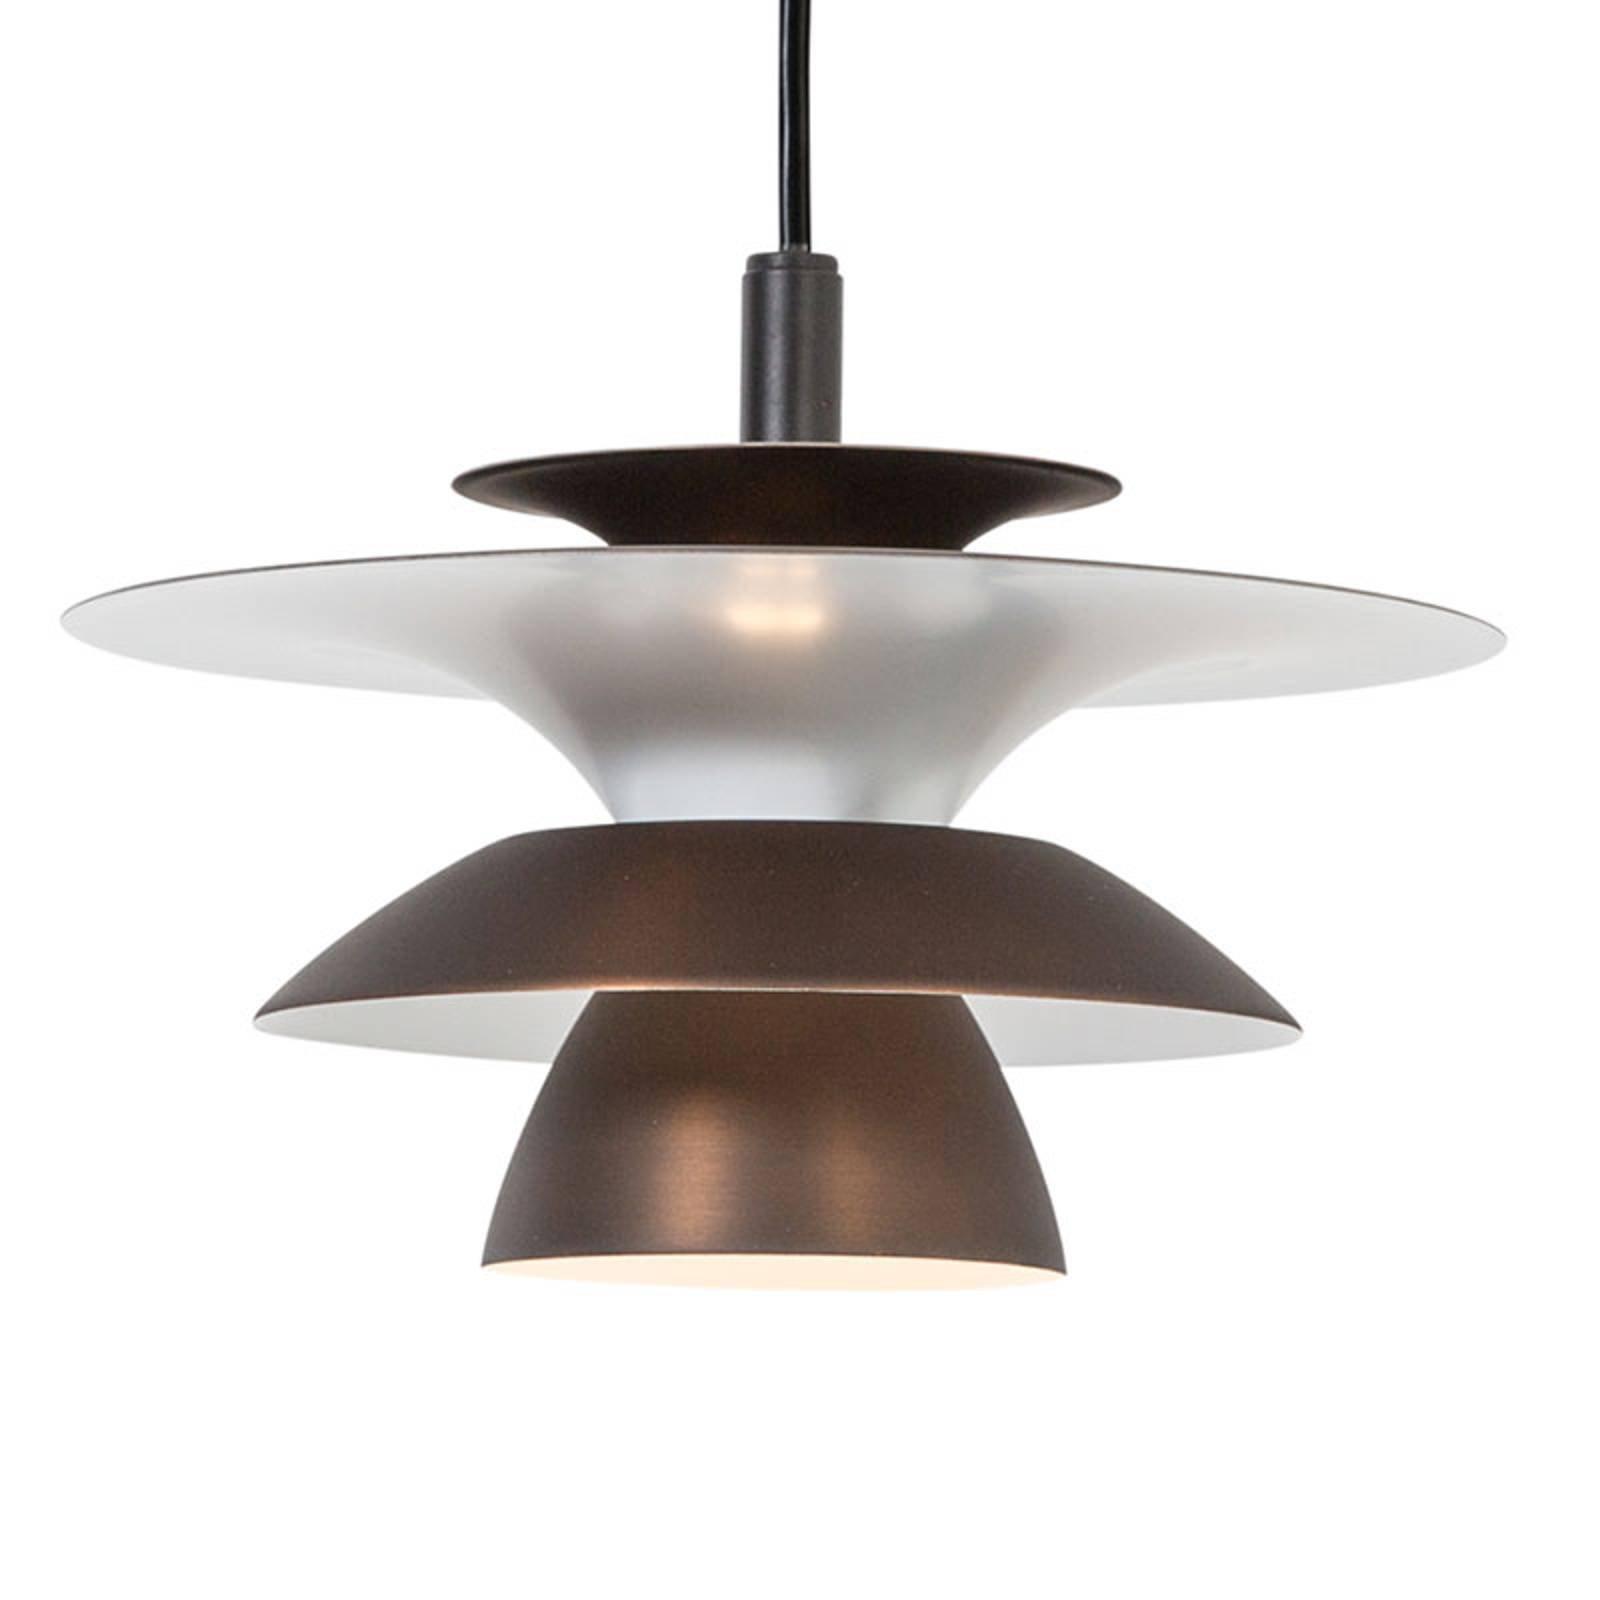 LED-pendellampe Picasso 1 lyskilde Ø 18cm rustbrun